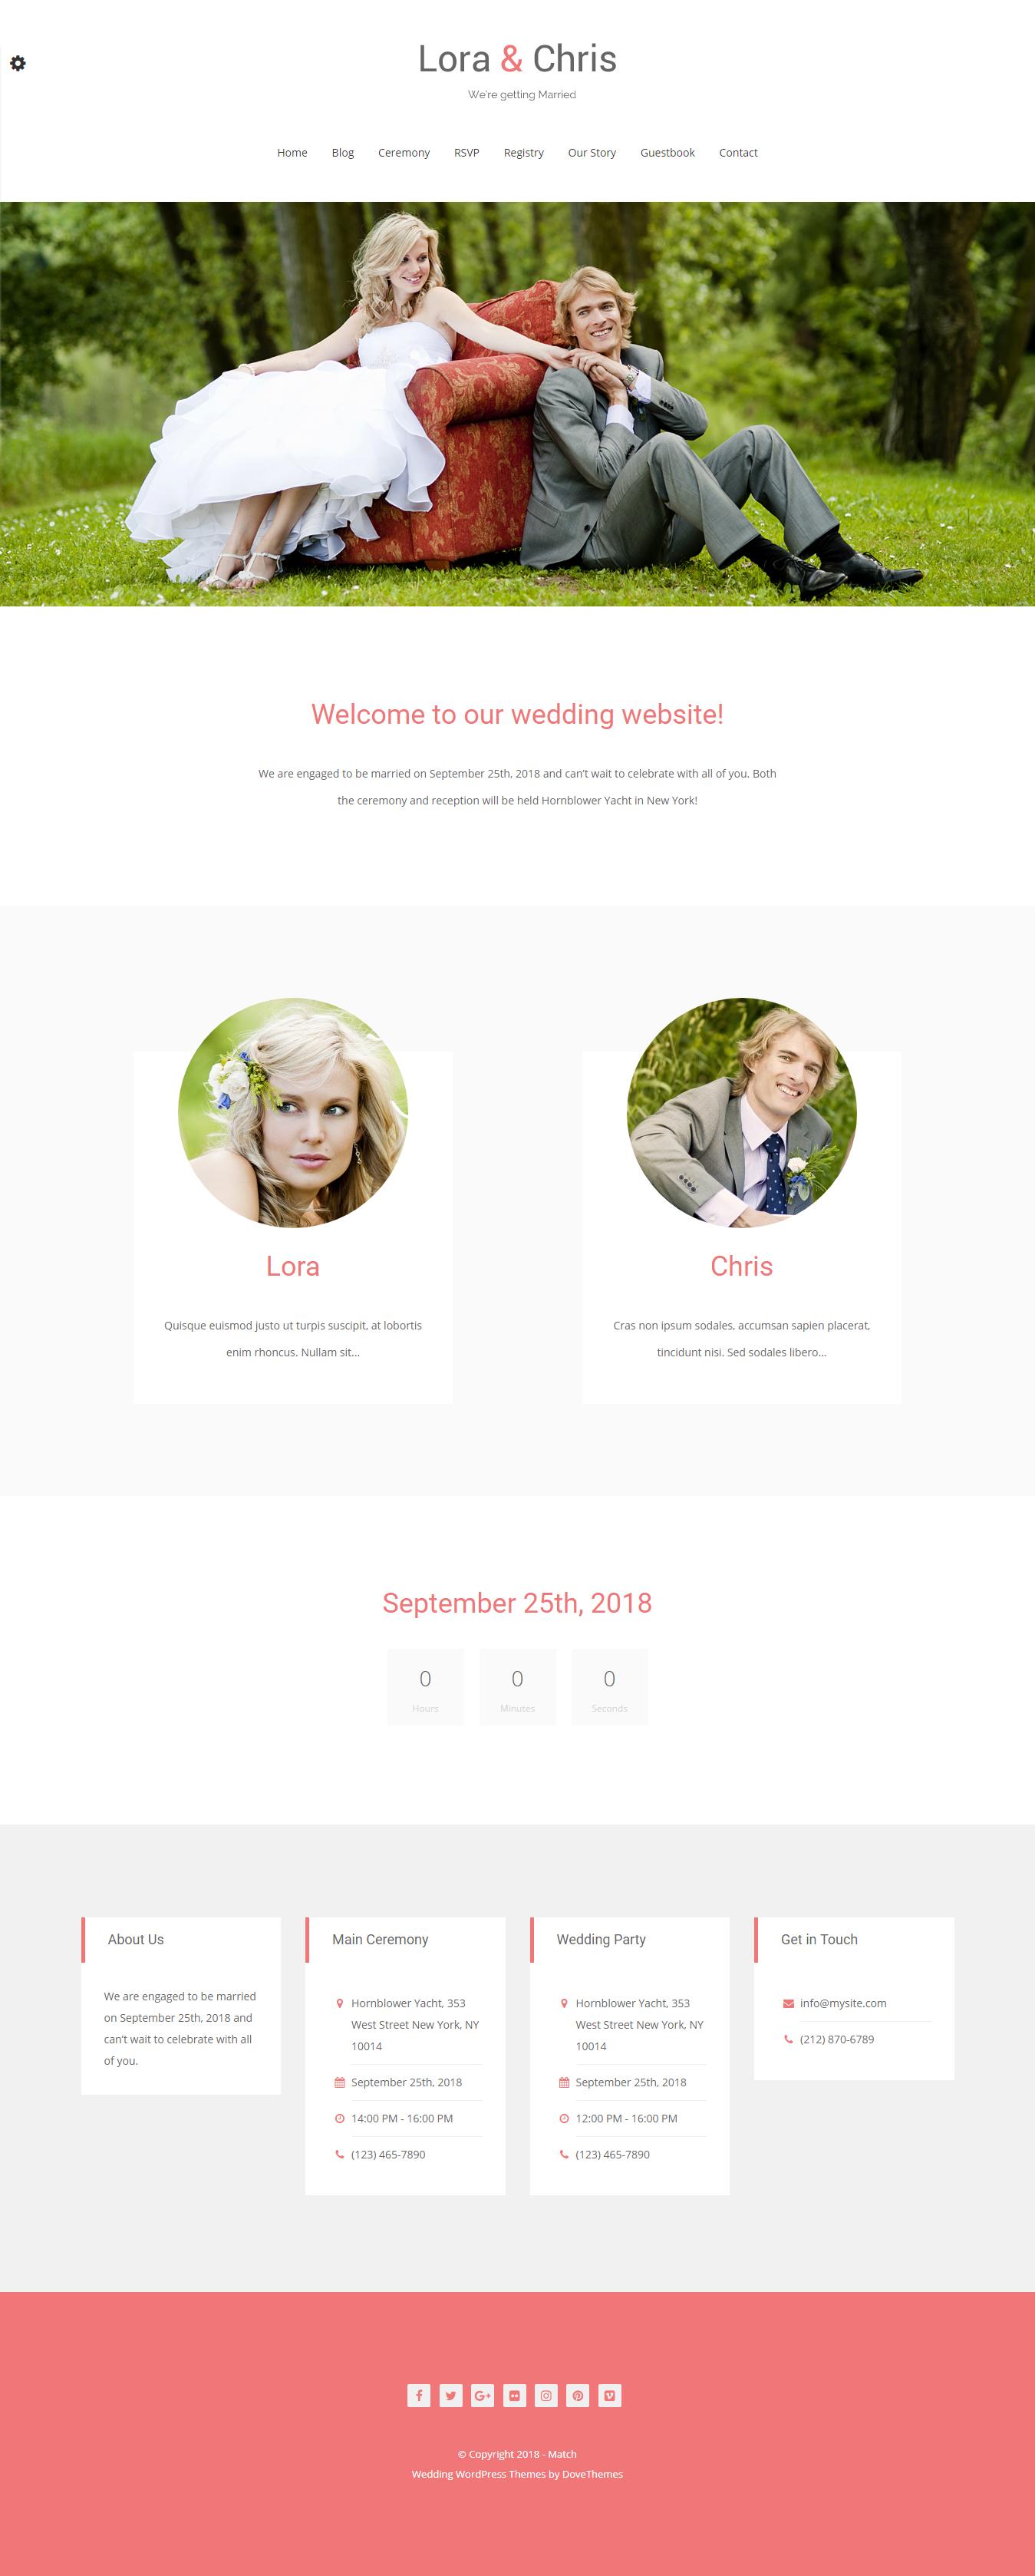 match best free wedding wordpress theme - 10+ Best Free Wedding WordPress Themes